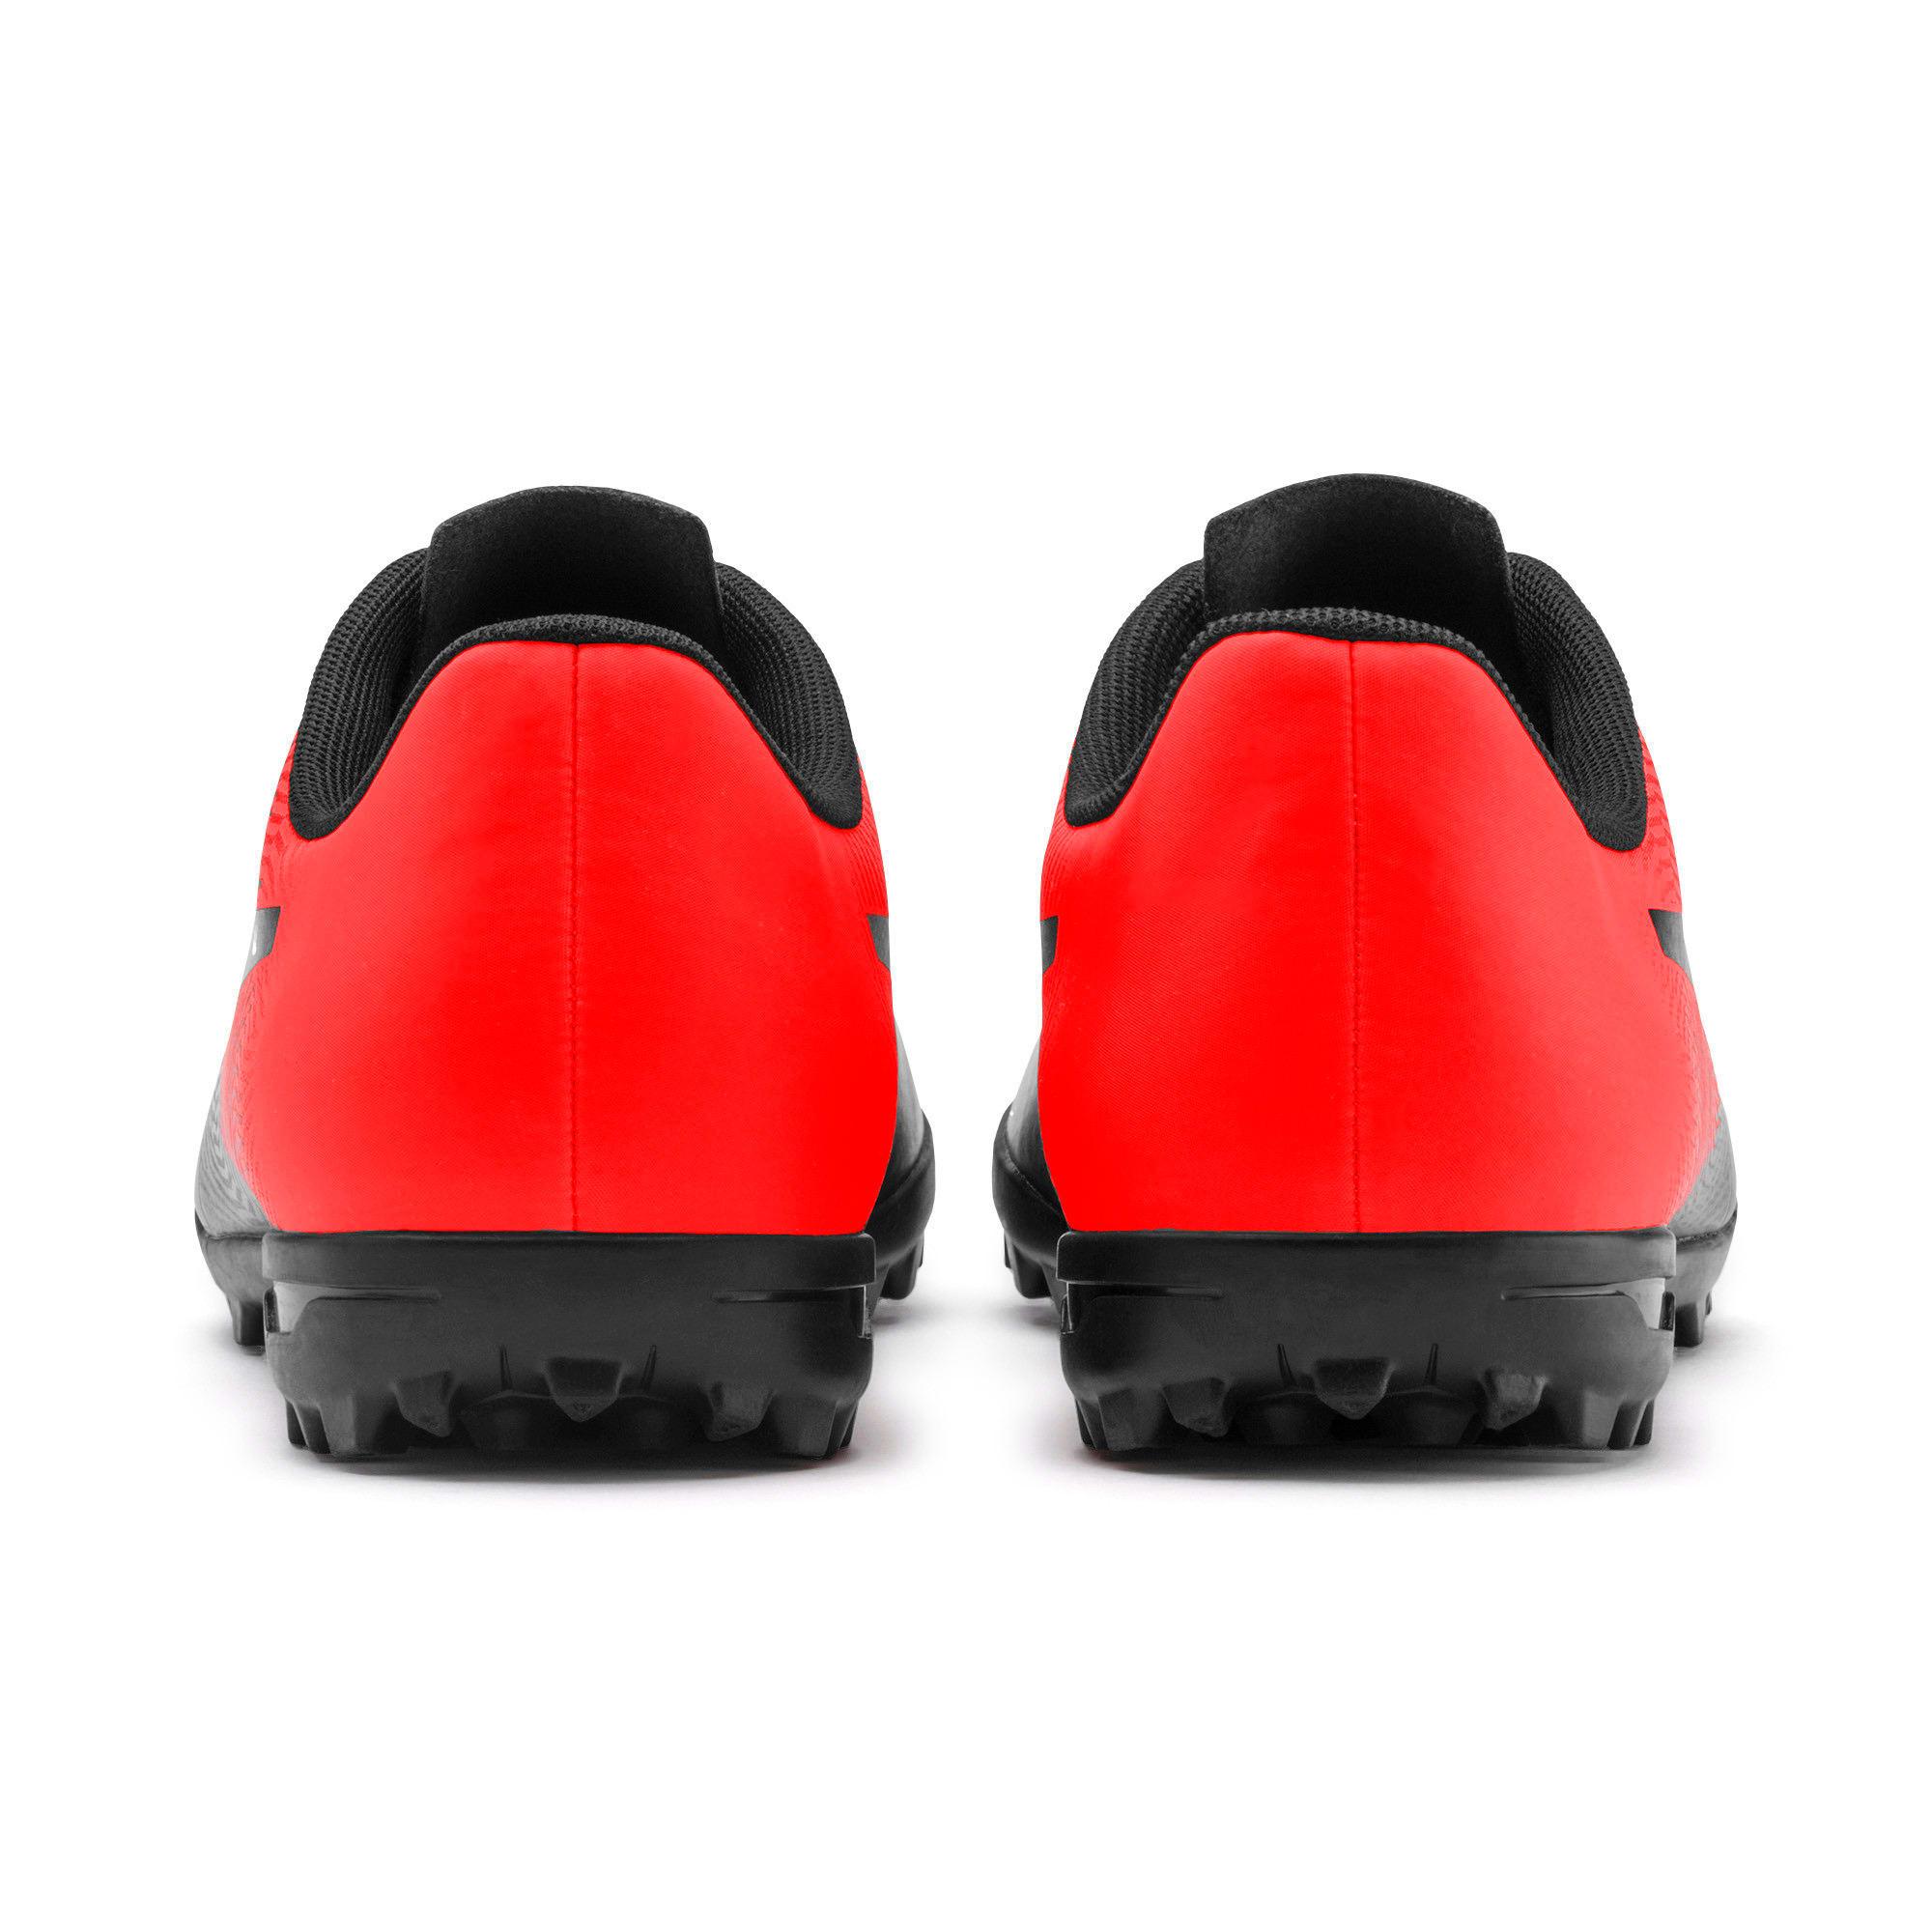 Thumbnail 4 of PUMA Spirit II TT Men's Soccer Shoes, Puma Black-Nrgy Red, medium